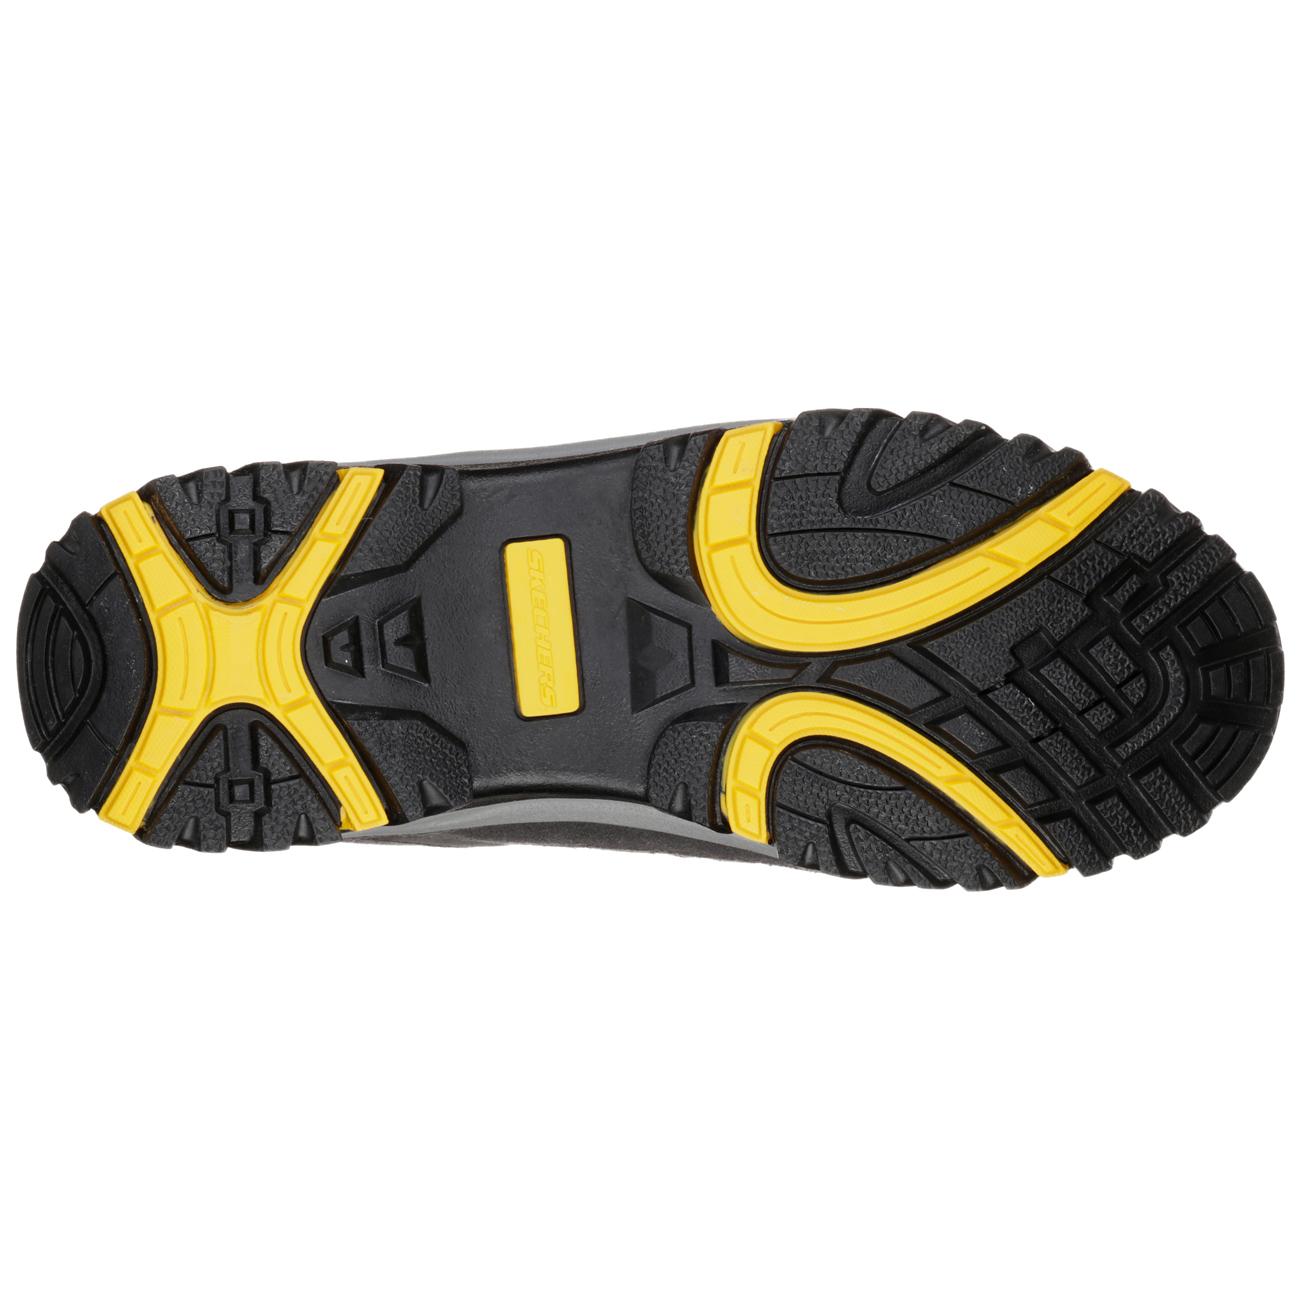 Mens Skechers Relment Songeo Running Jogging Gym Gym Gym Sport Fitness Trainer All Größes 91bb81